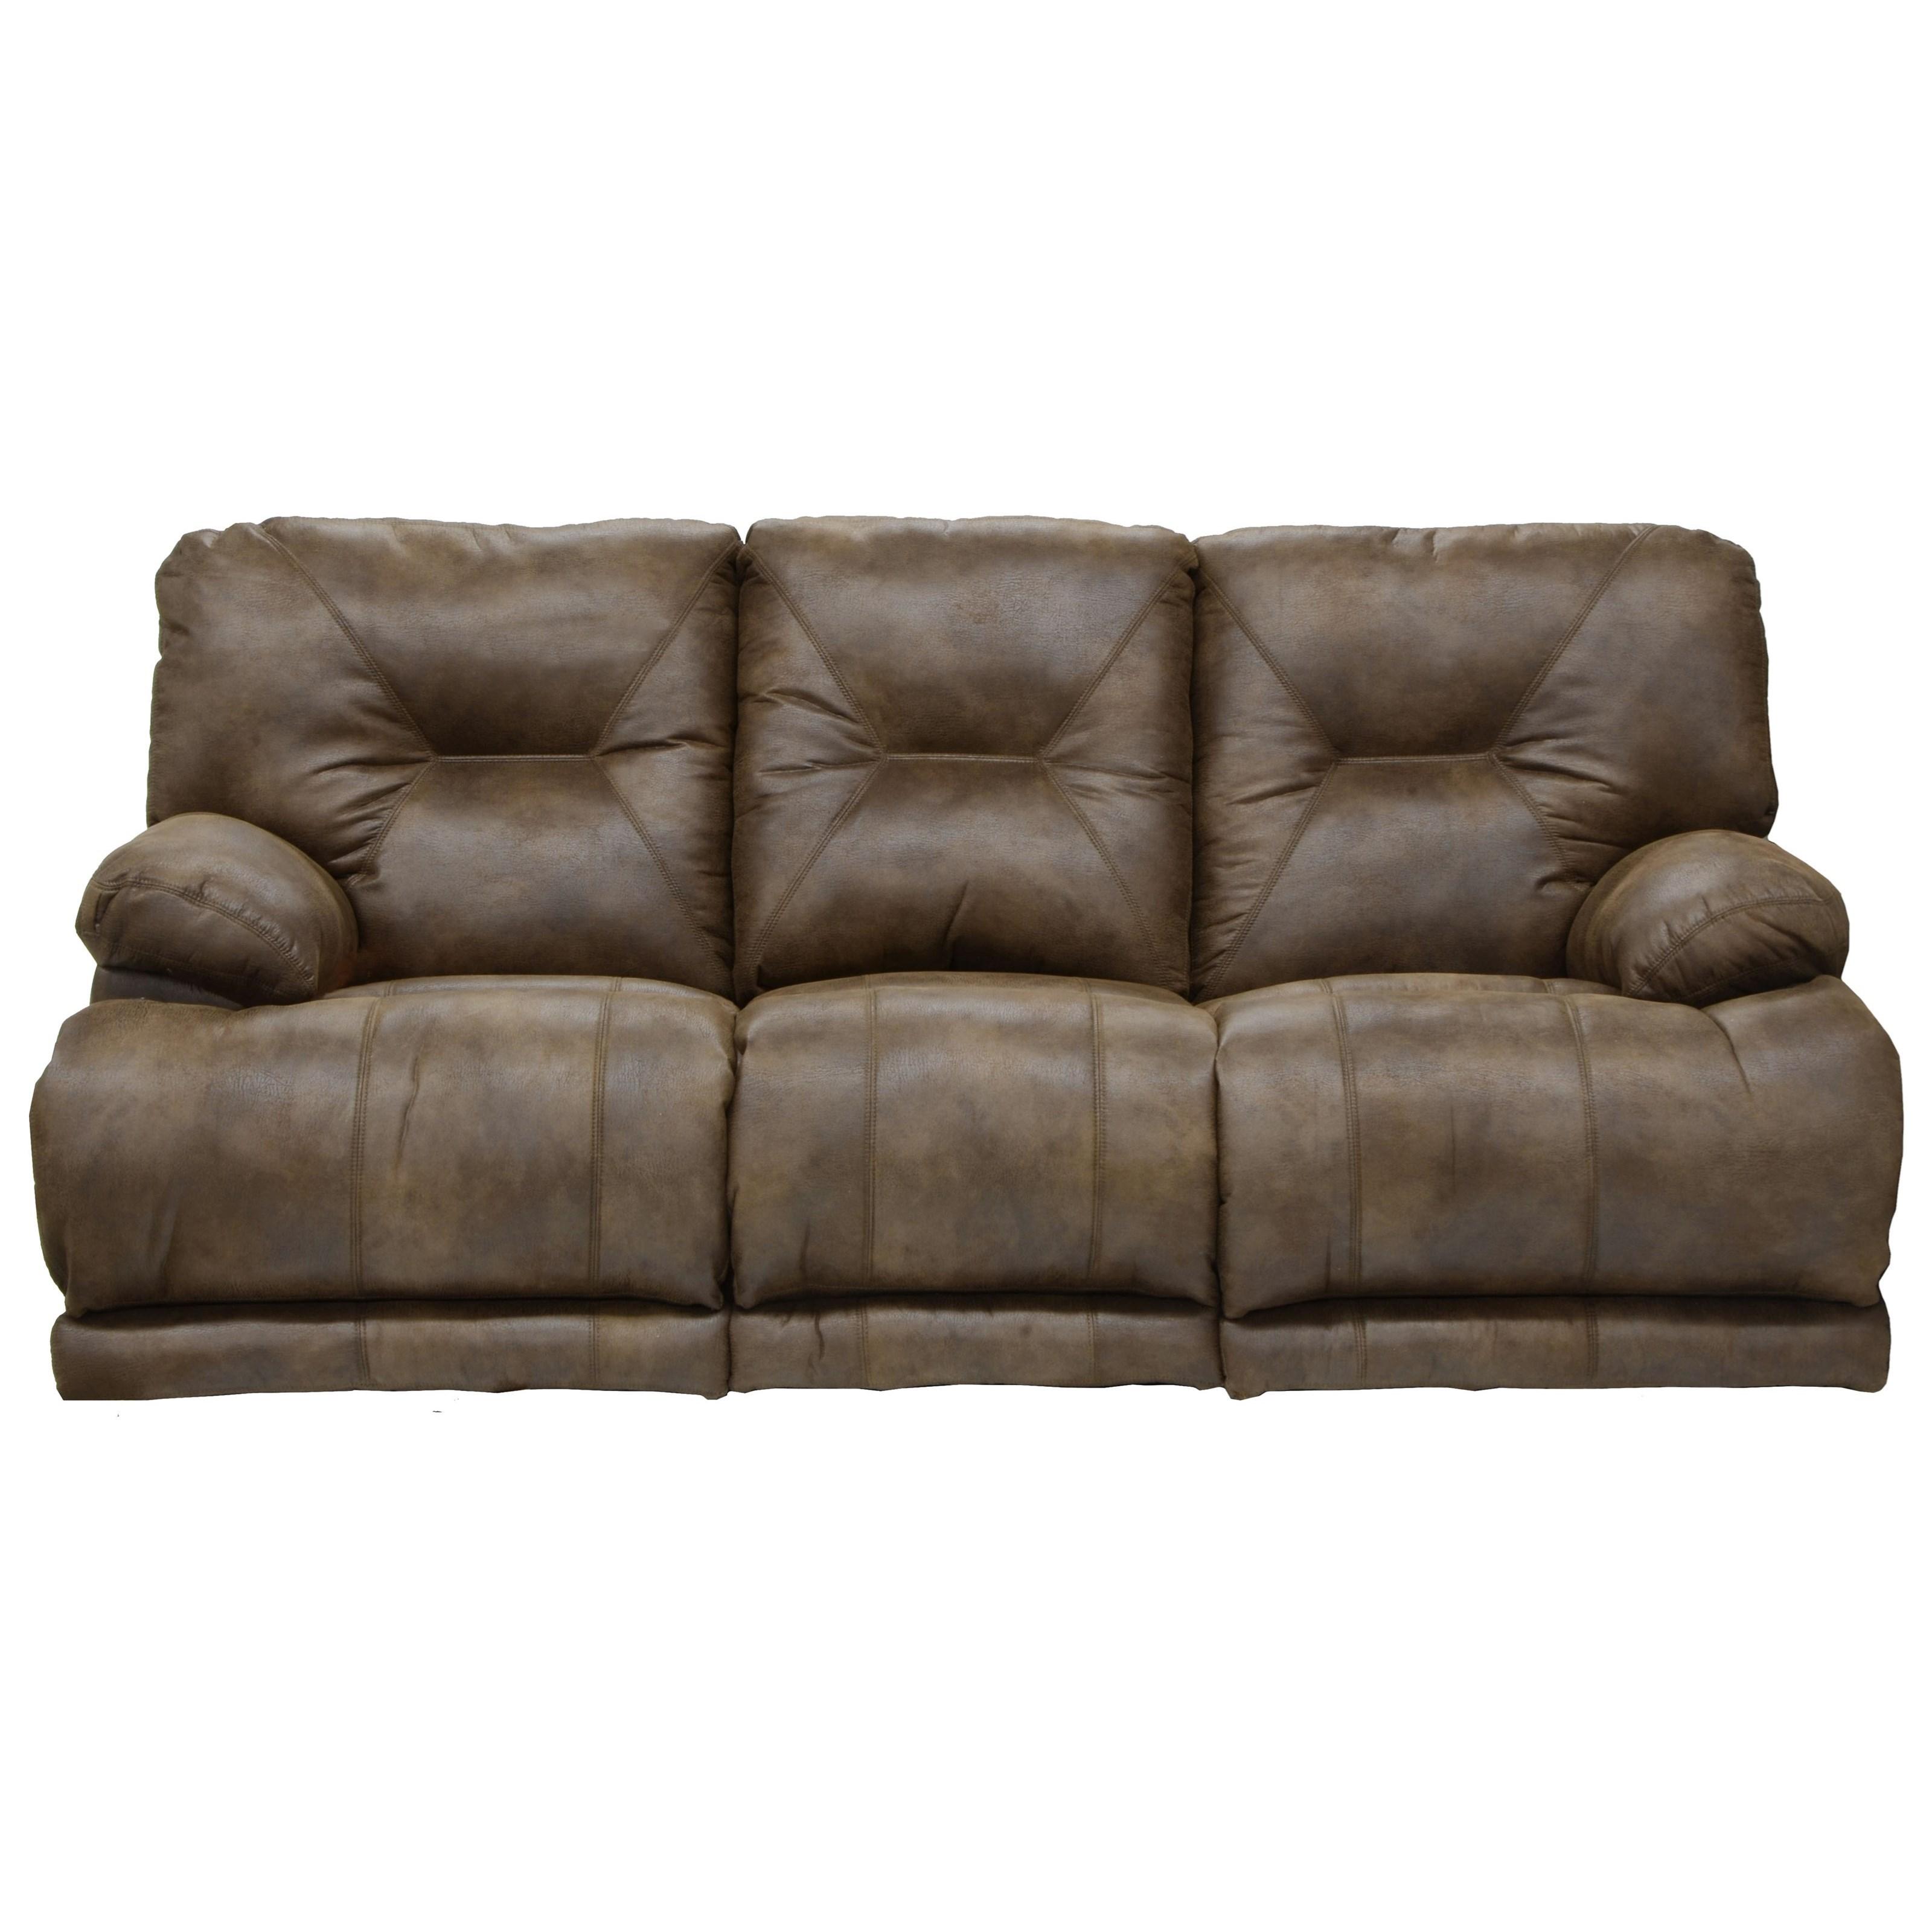 Catnapper Voyager 643845 Power Lay Flat Reclining Sofa